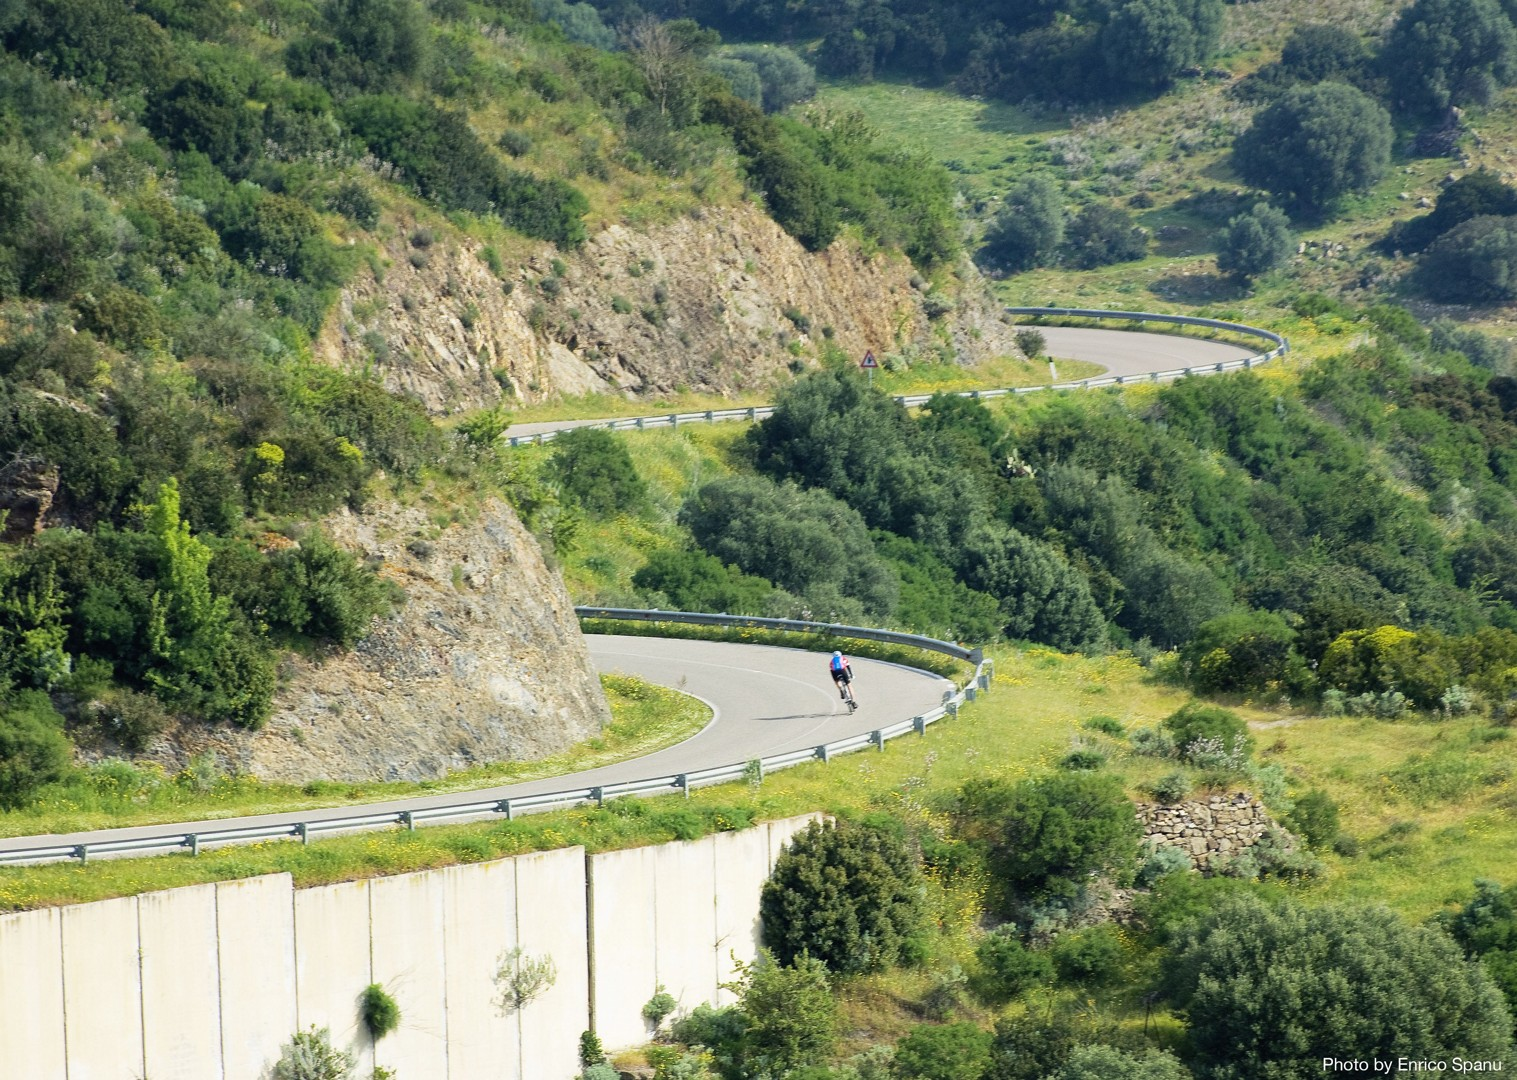 Sardinia-Sardinian-Mountains-Guided-Road-Cycling-Holiday-Monte-Albo.jpg - Italy - Sardinia - Mountain Explorer - Guided Road Cycling Holiday - Italia Road Cycling